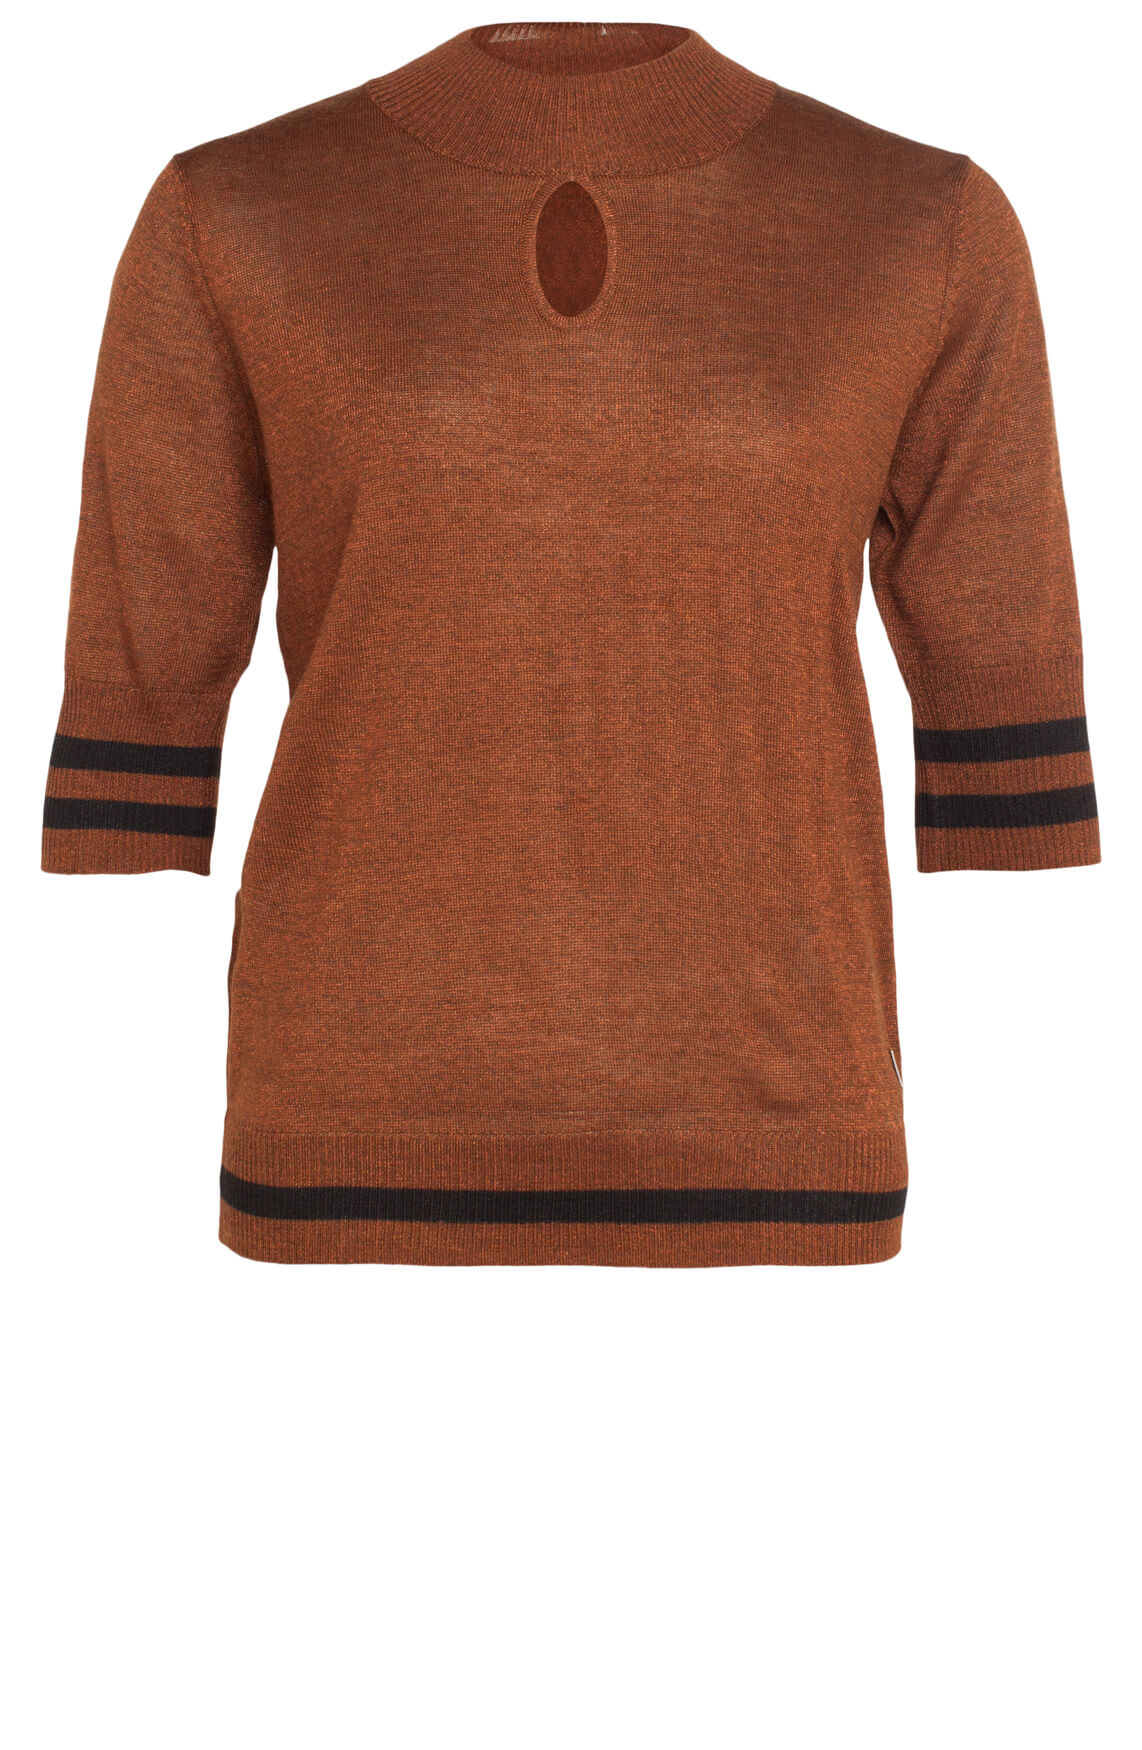 Anna Dames Sportieve pullover Bruin